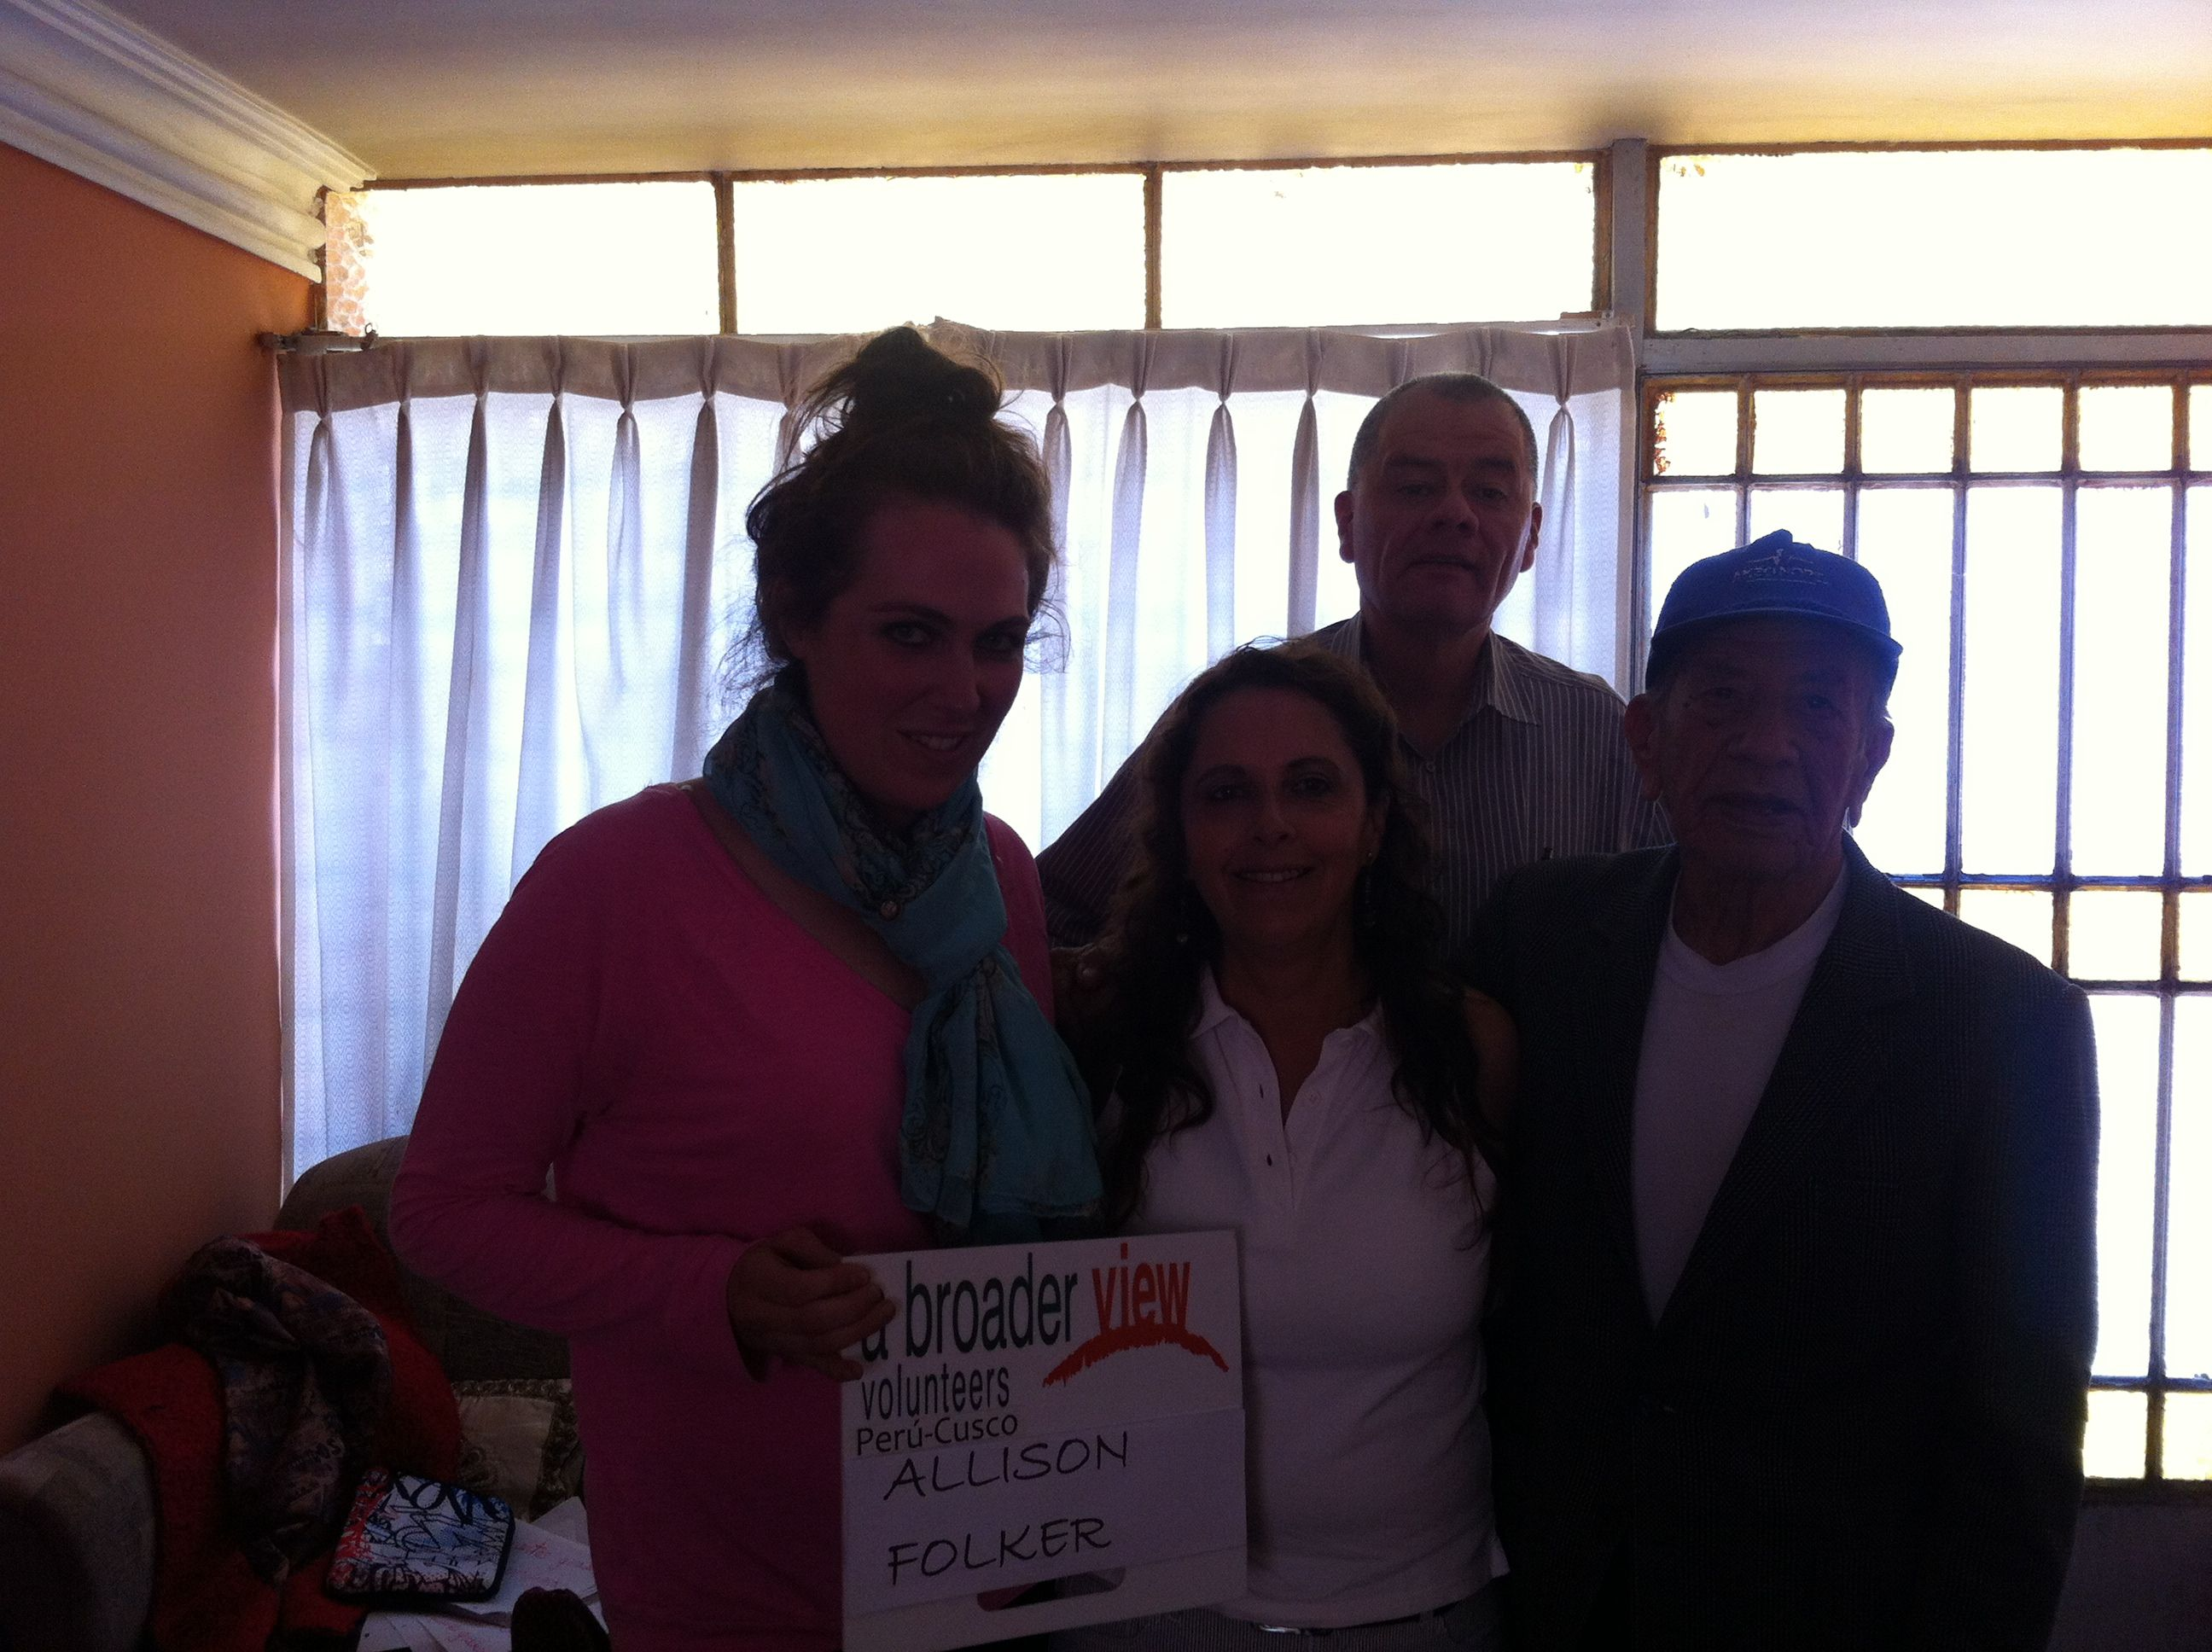 Volunteer Allison Folker Peru Cusco Health Care & Spanish Immersion 4 weeks Program https://www.abroaderview.org